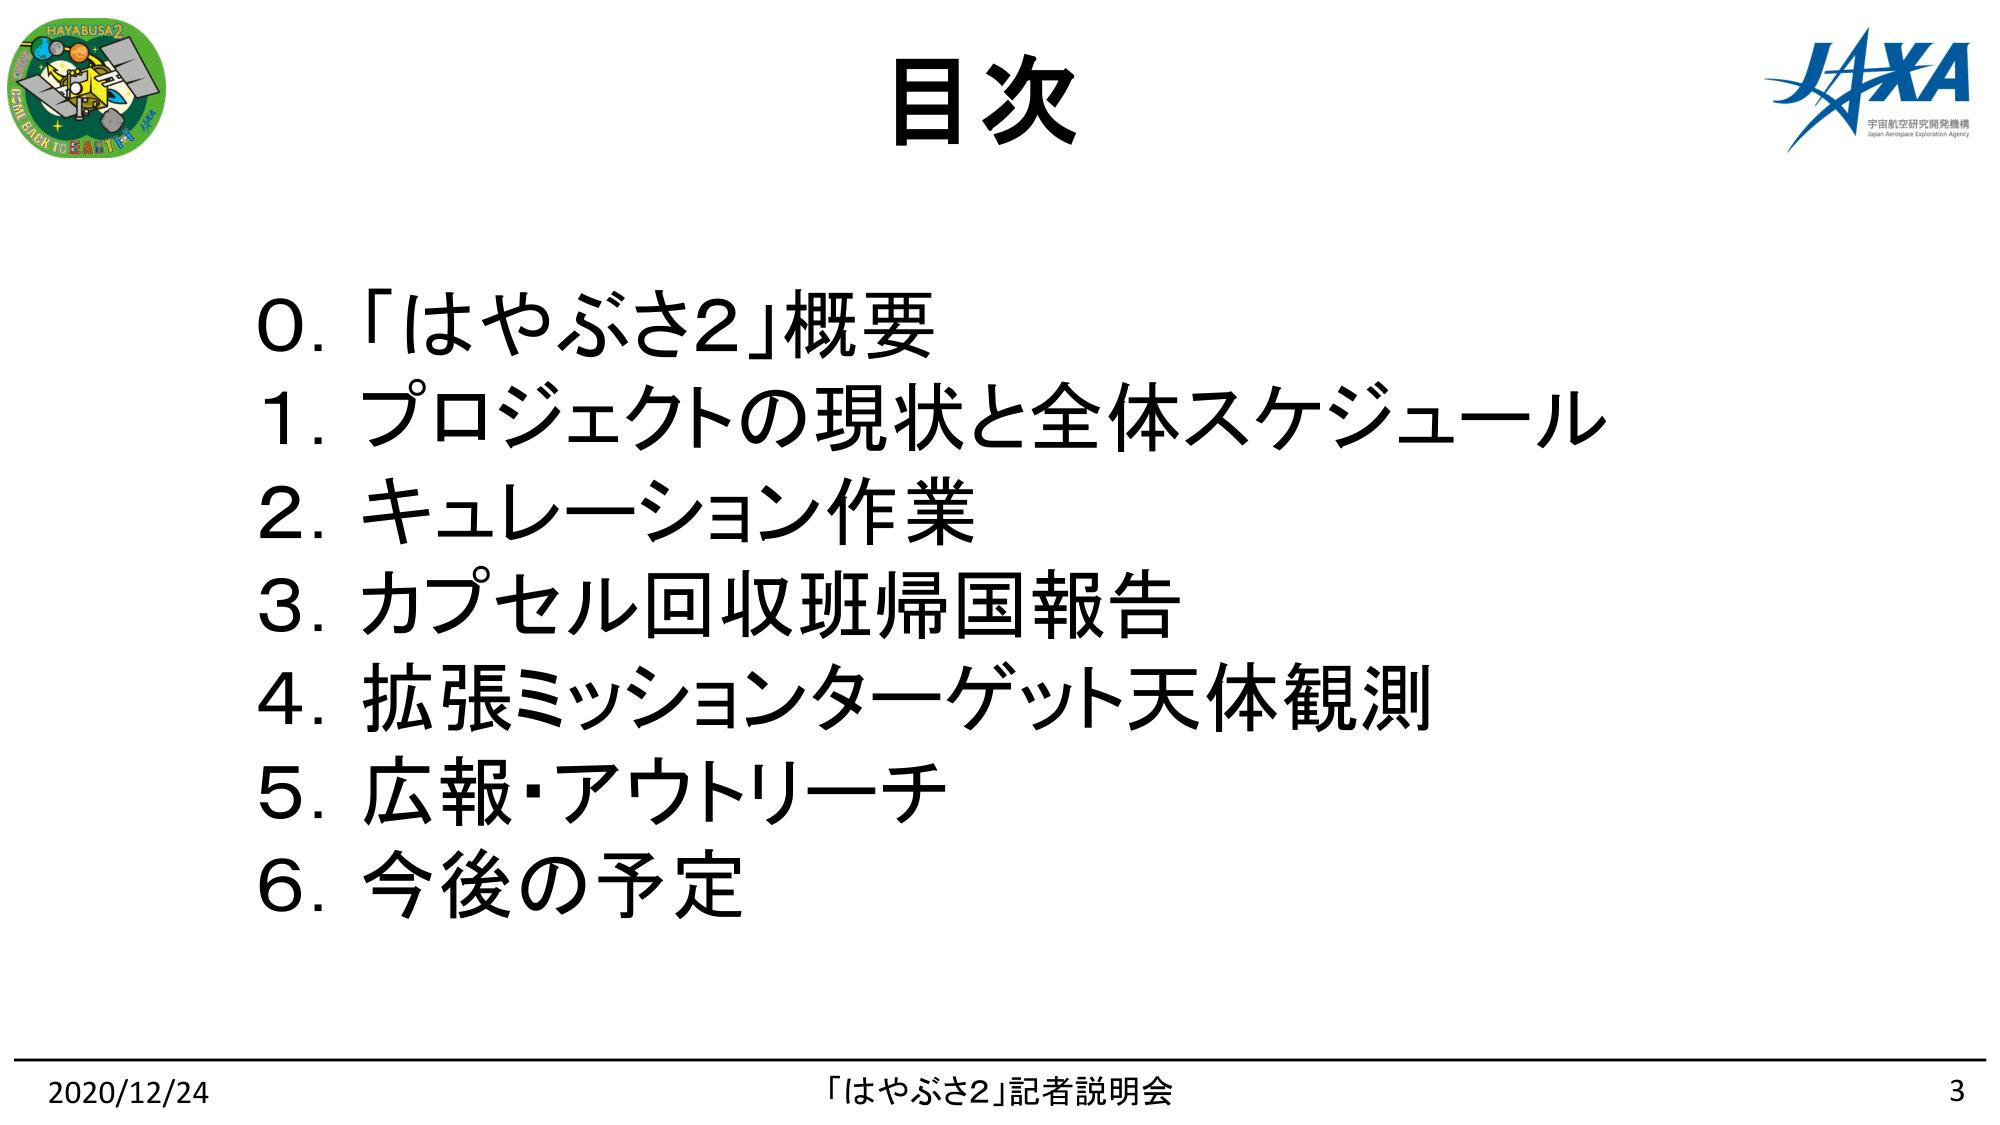 f:id:Imamura:20201224134951p:plain